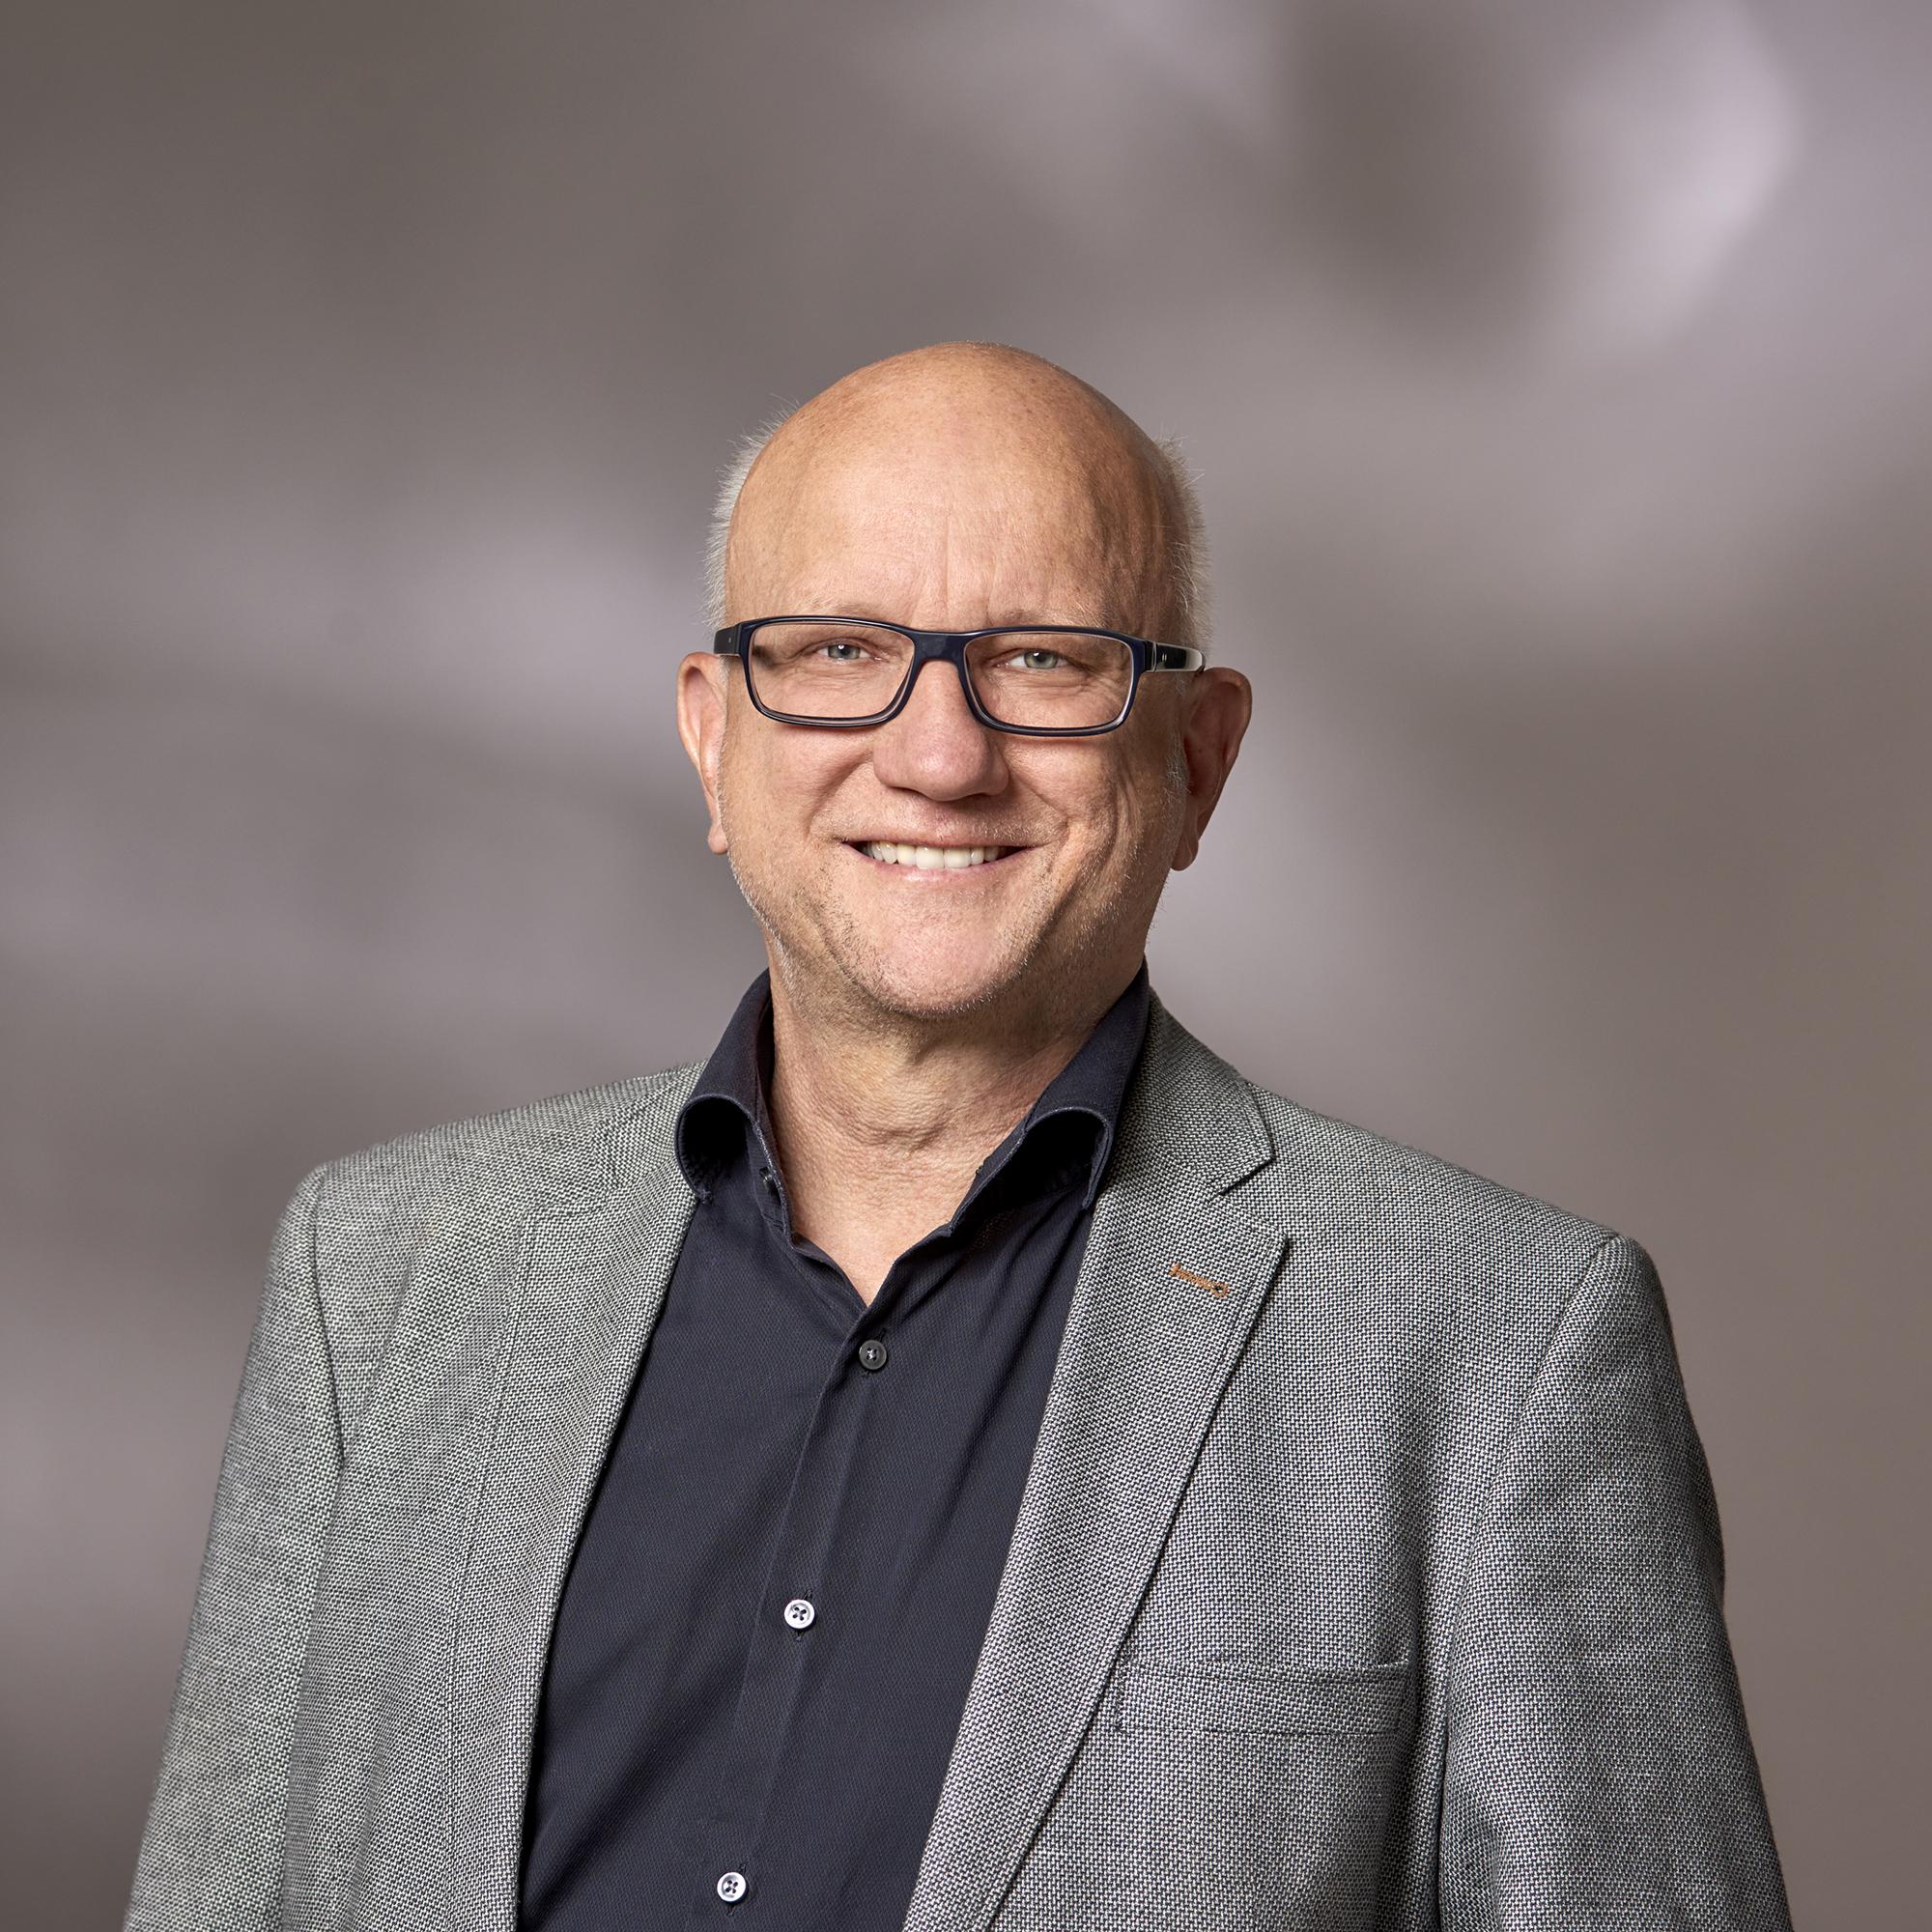 Wilfried Buch